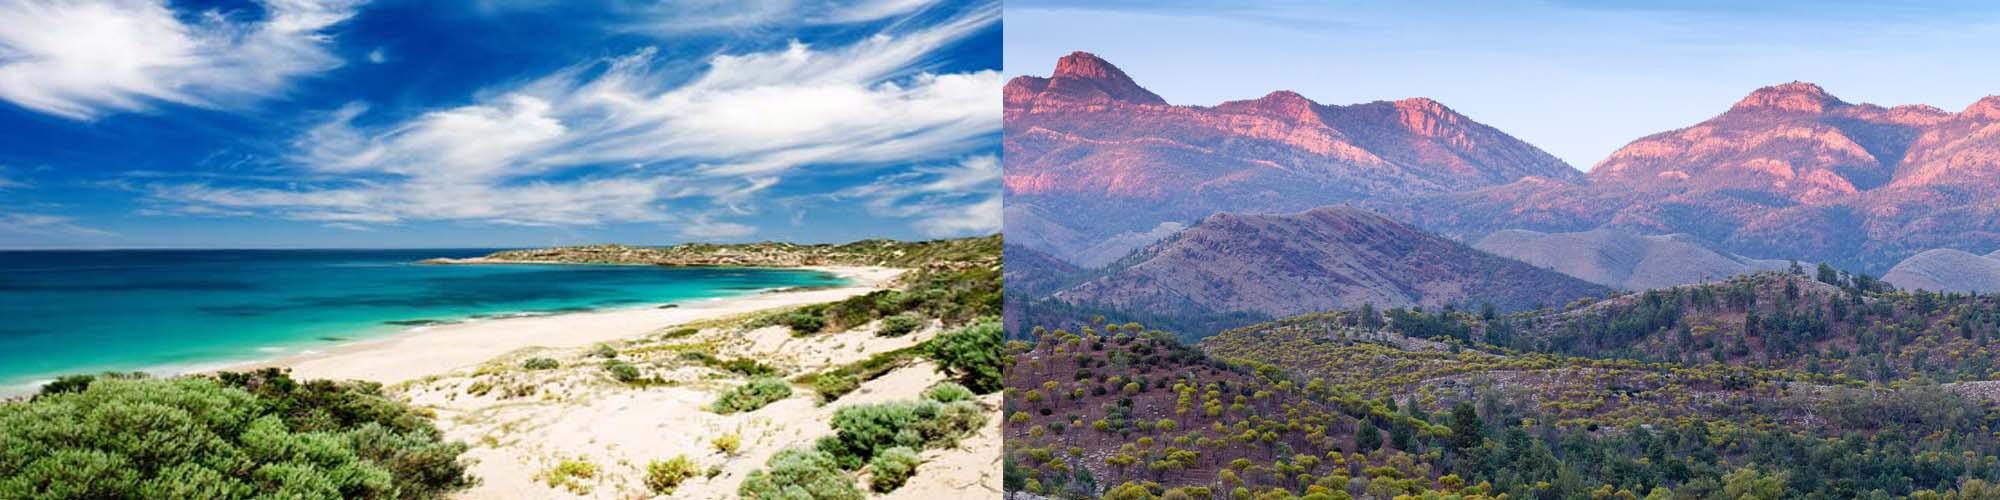 10 Day Yorke Peninsula and Flinders Ranges Walk